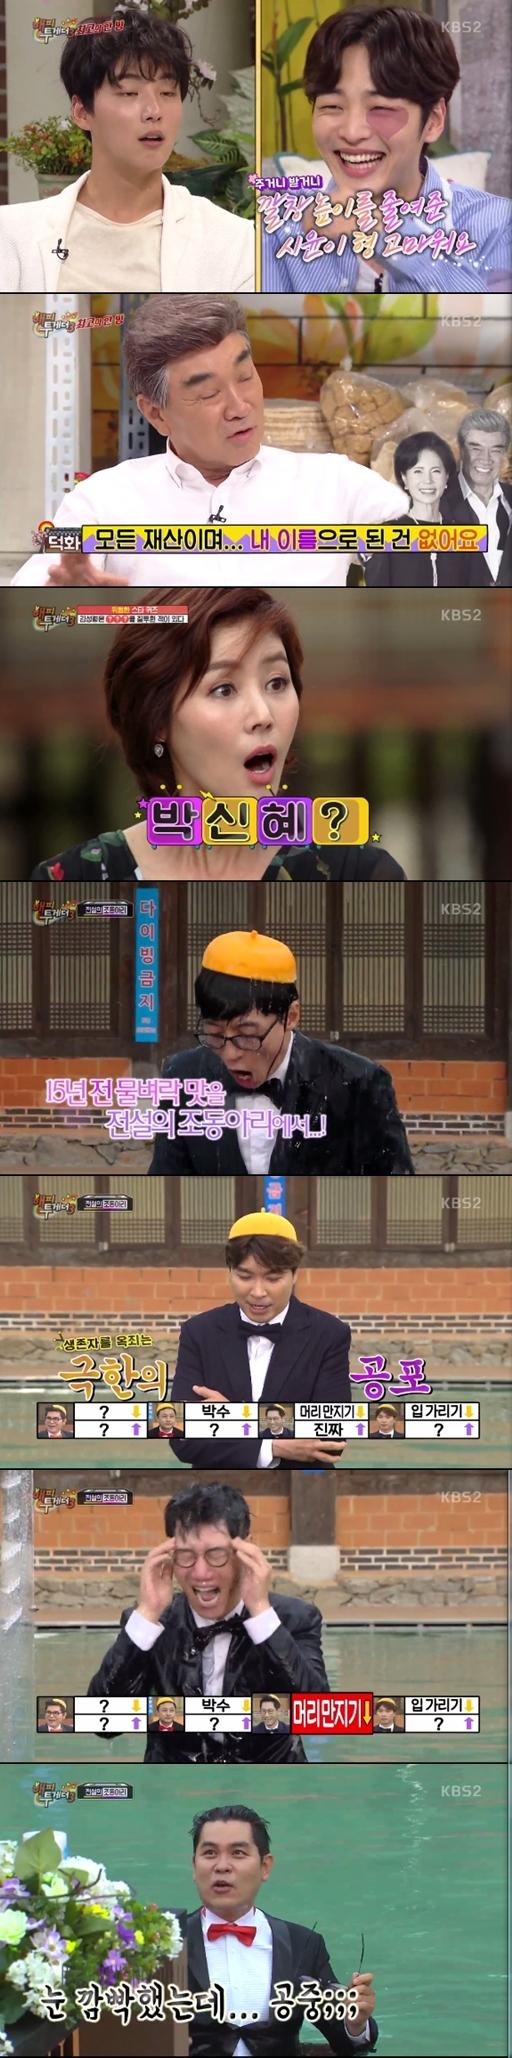 [TV:스코어] '해투3', '위험한 초대' 소환에도 시청률은 하락